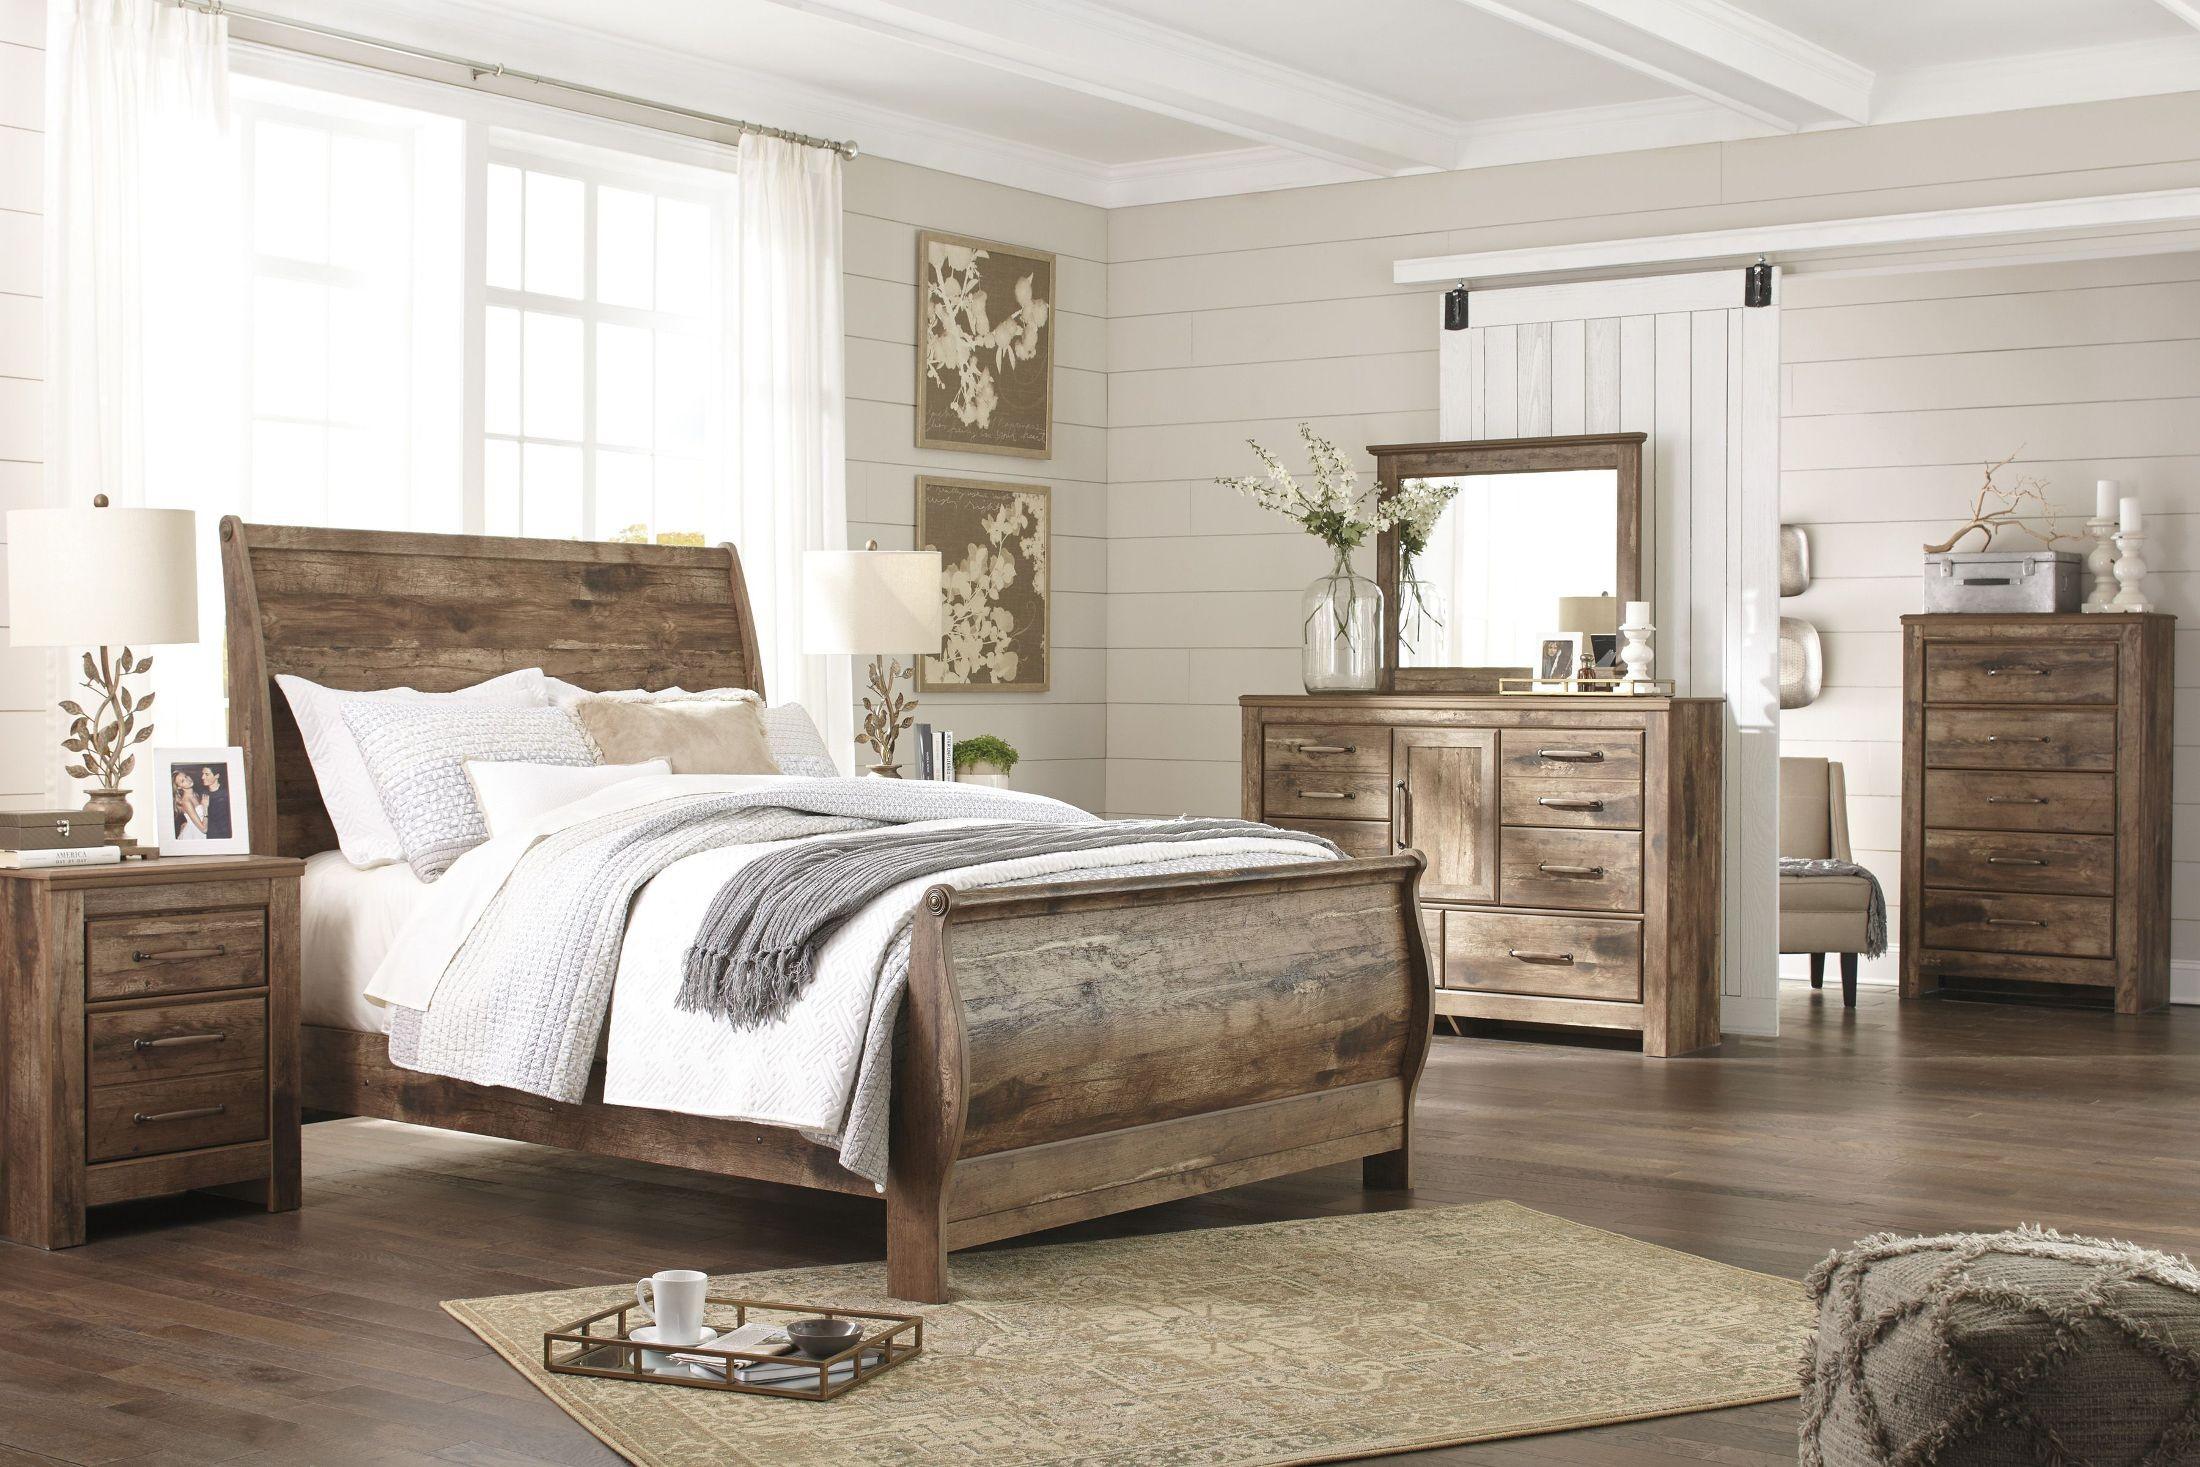 Blaneville brown sleigh bedroom set b224 74 77 98 ashley for Bedroom furniture sets b q